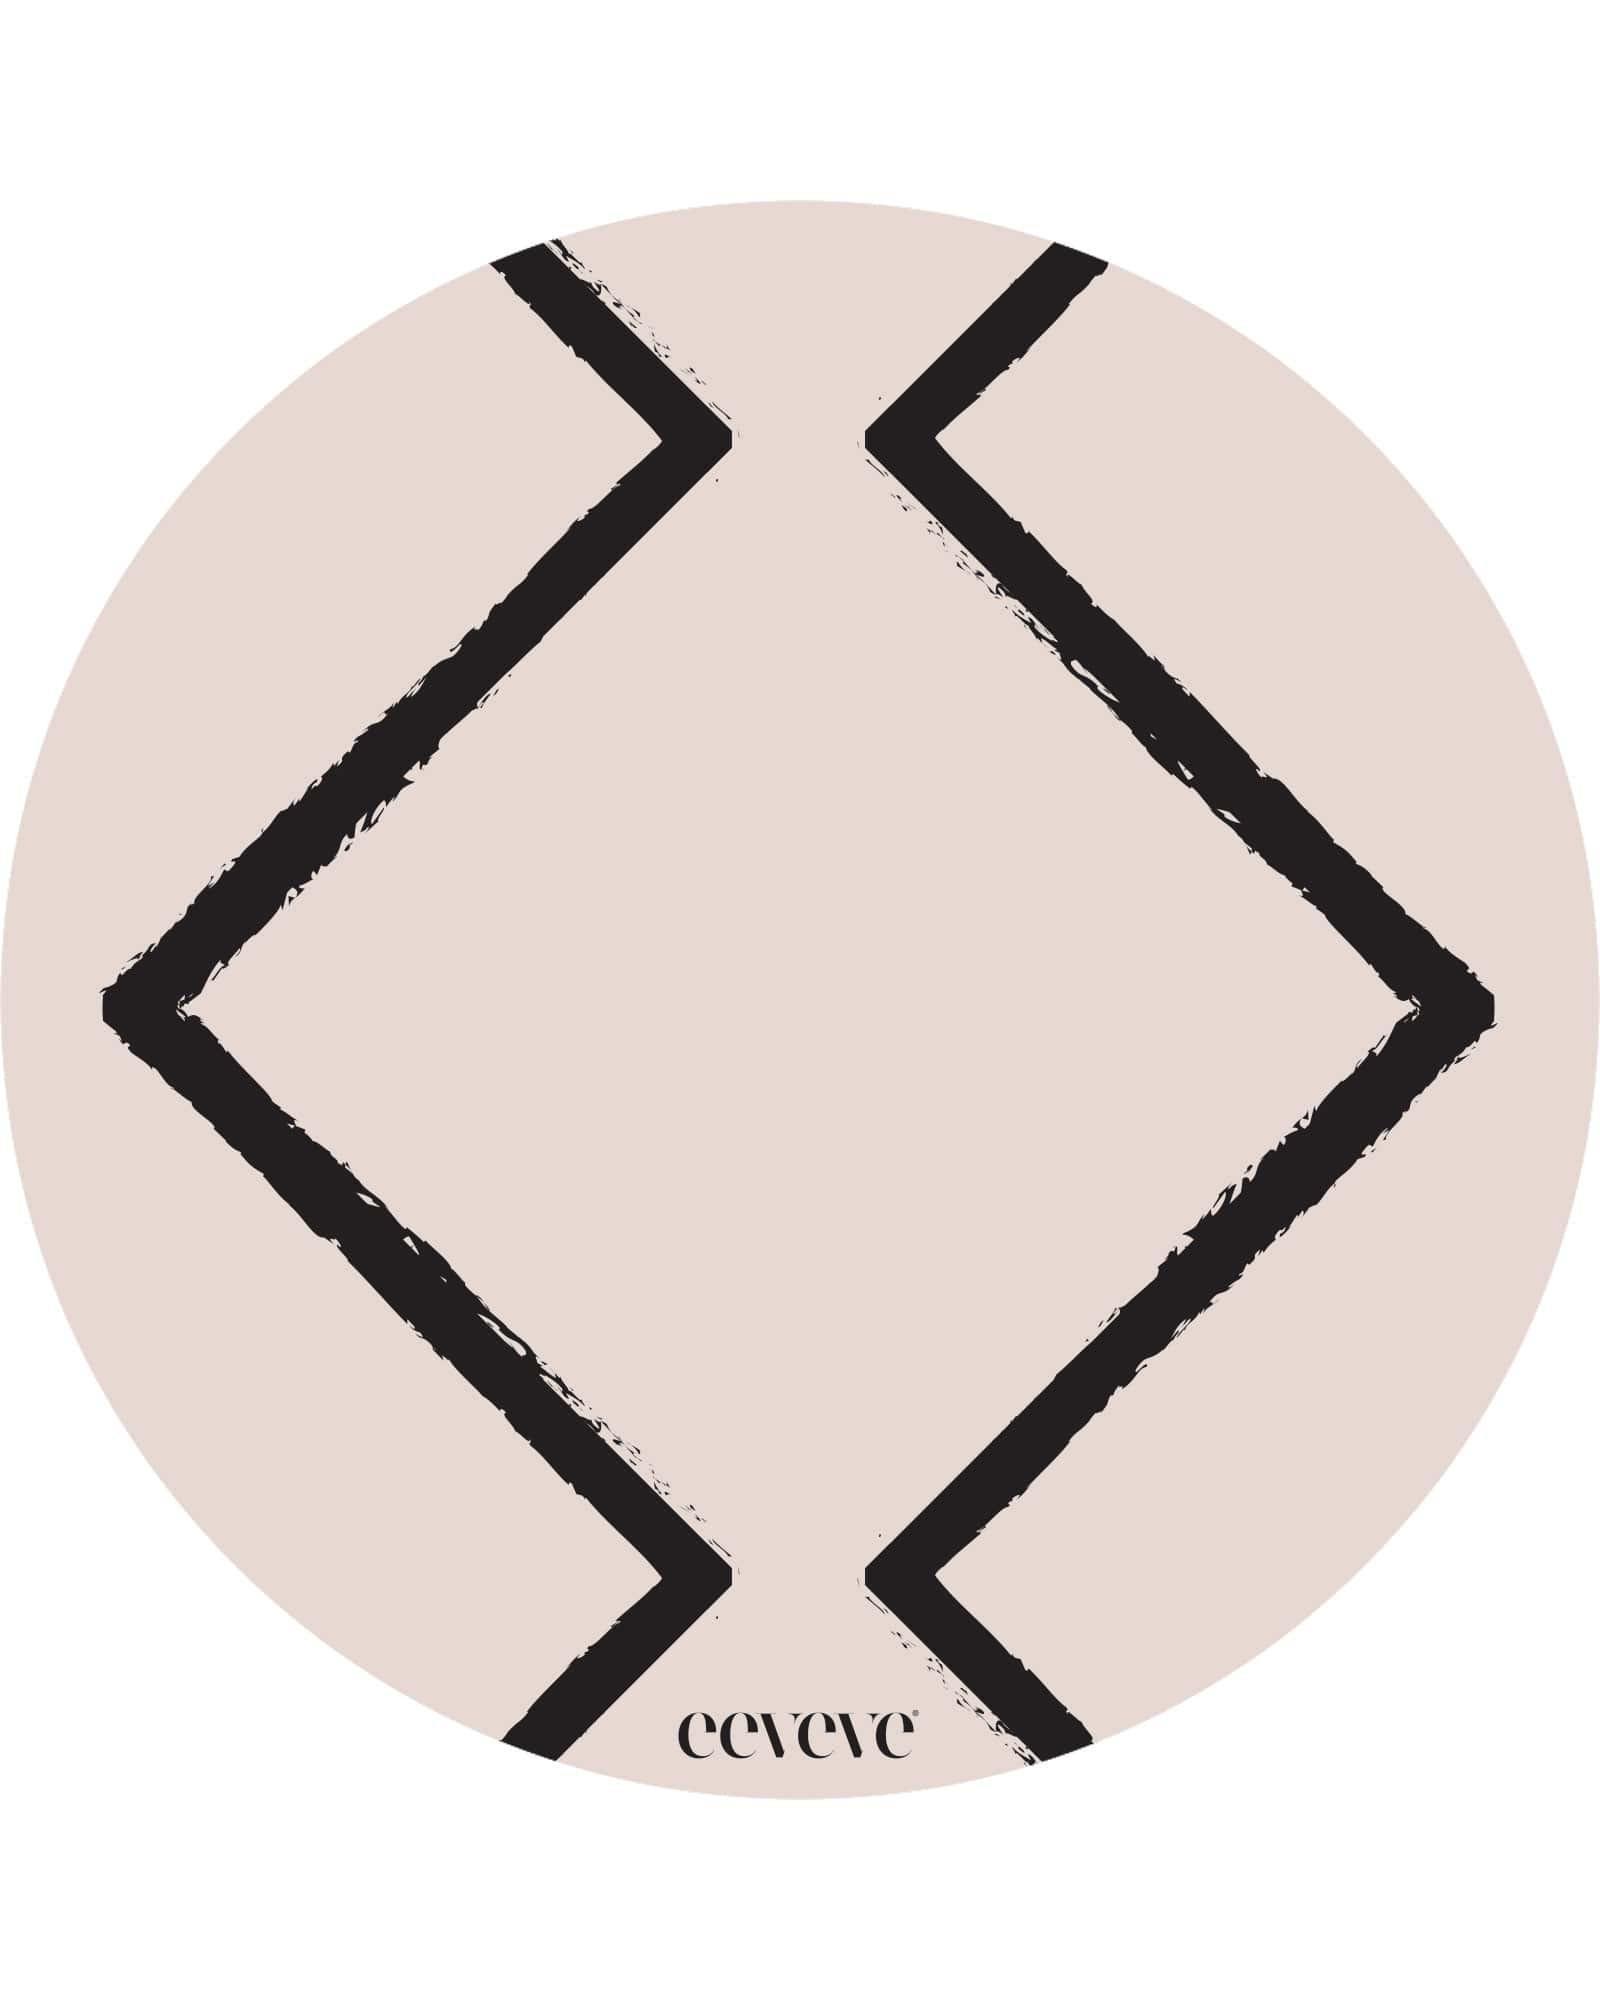 Eeveve - 12x Onderleggers Beni - Ecru